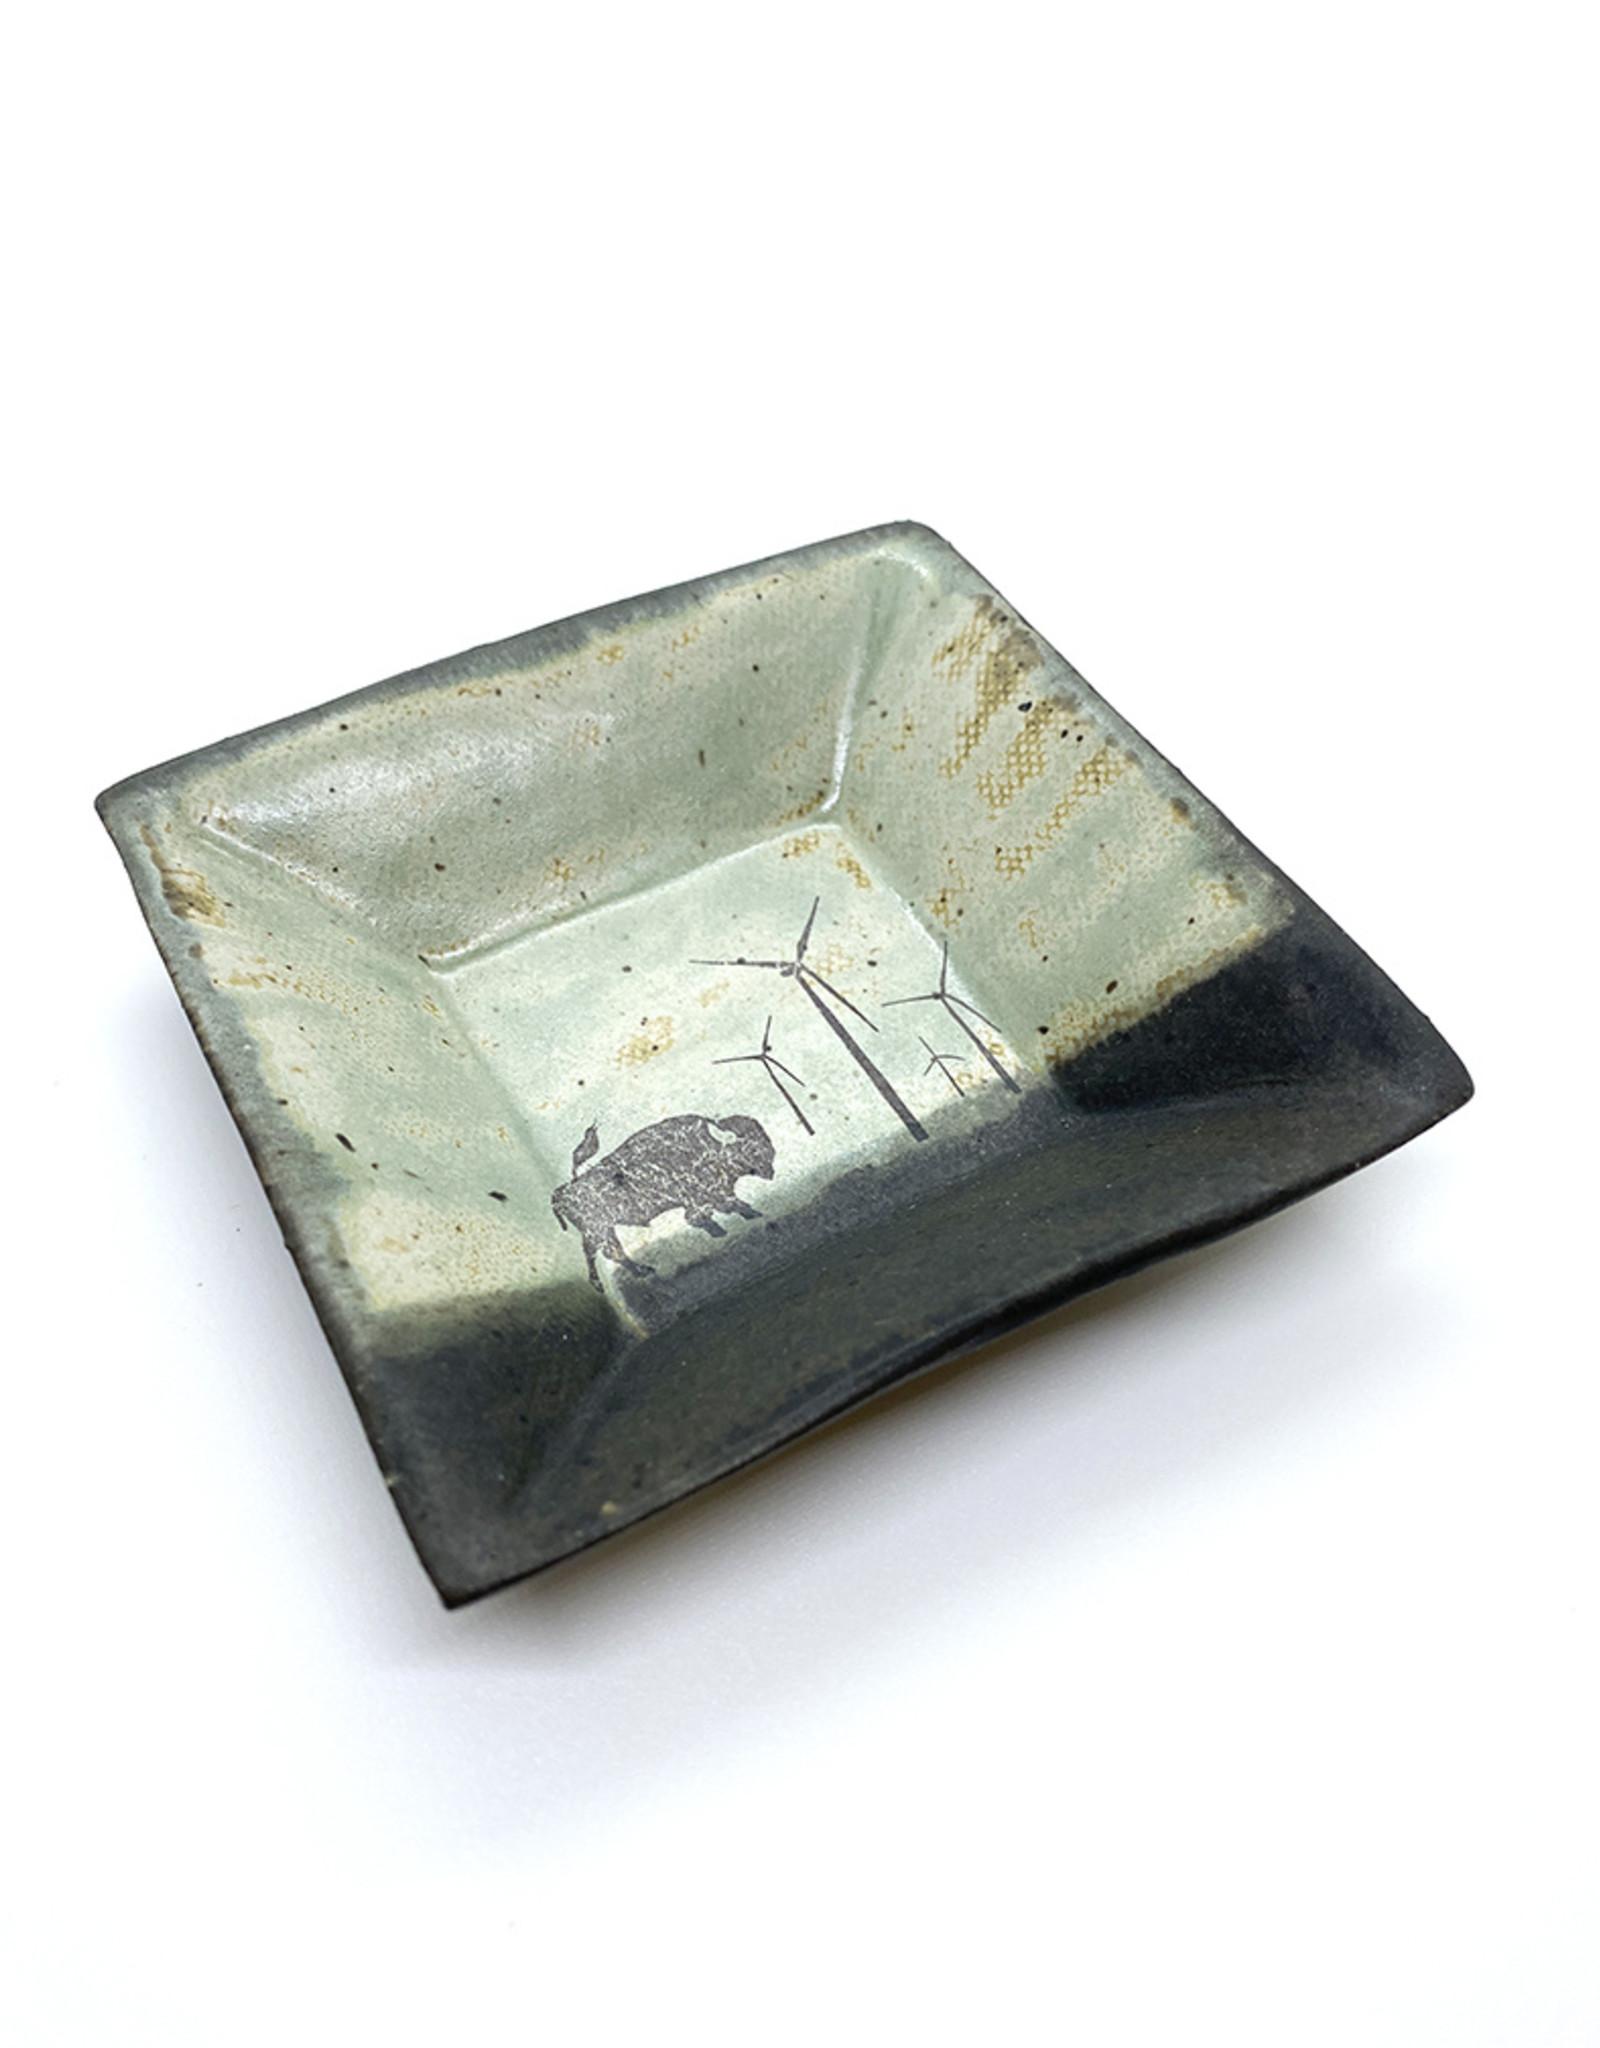 Melanie Harvey Pottery Mini Dishes by Melanie Harvey Pottery